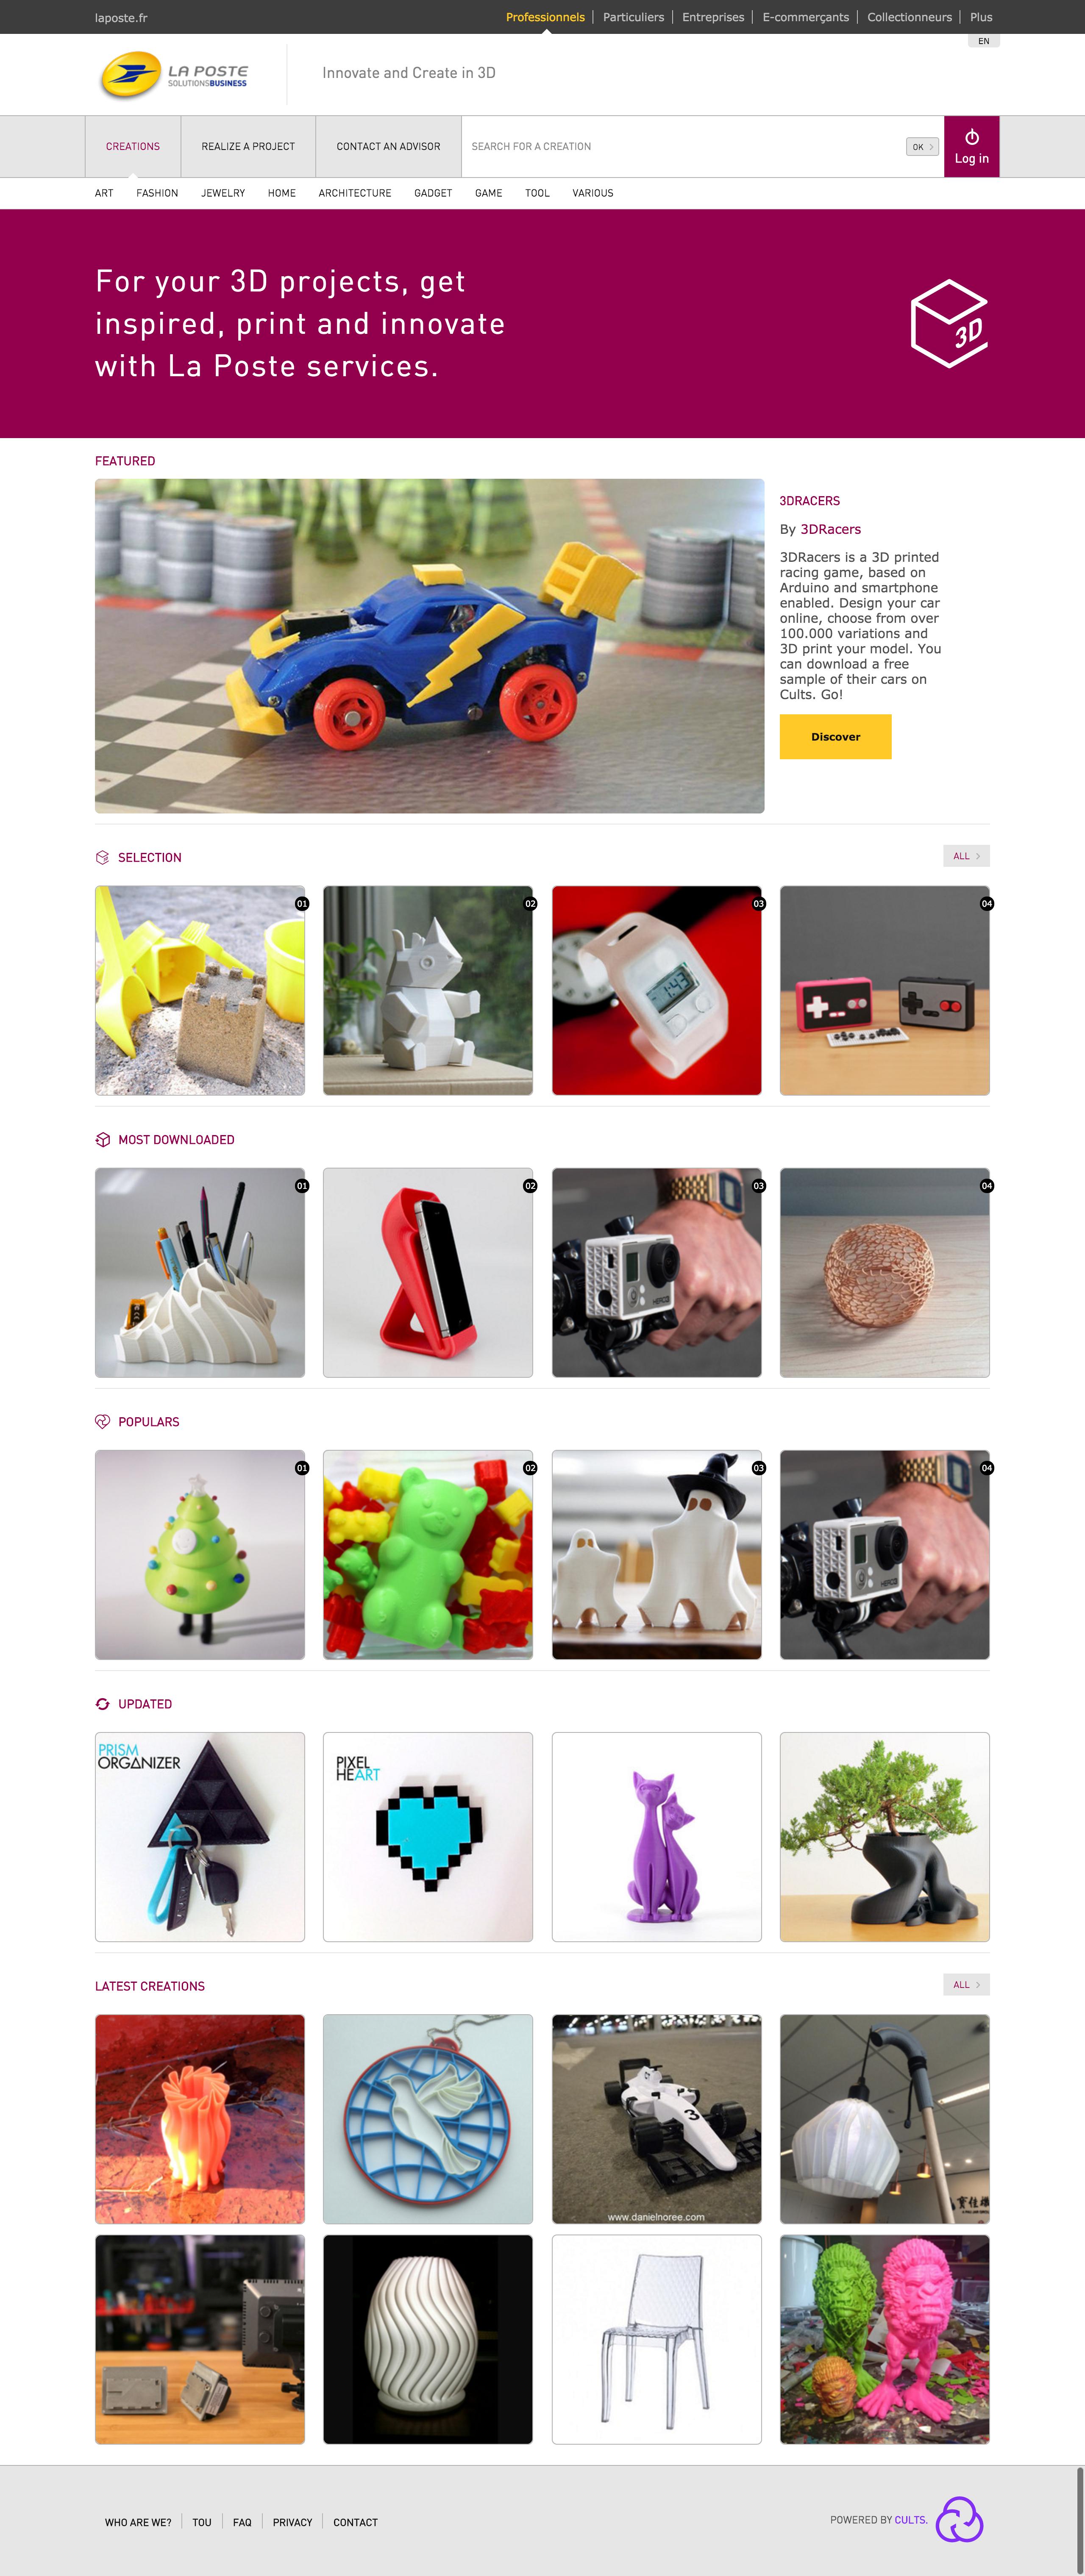 2 La Poste Home Page ・ Download free 3D models for 3D printers